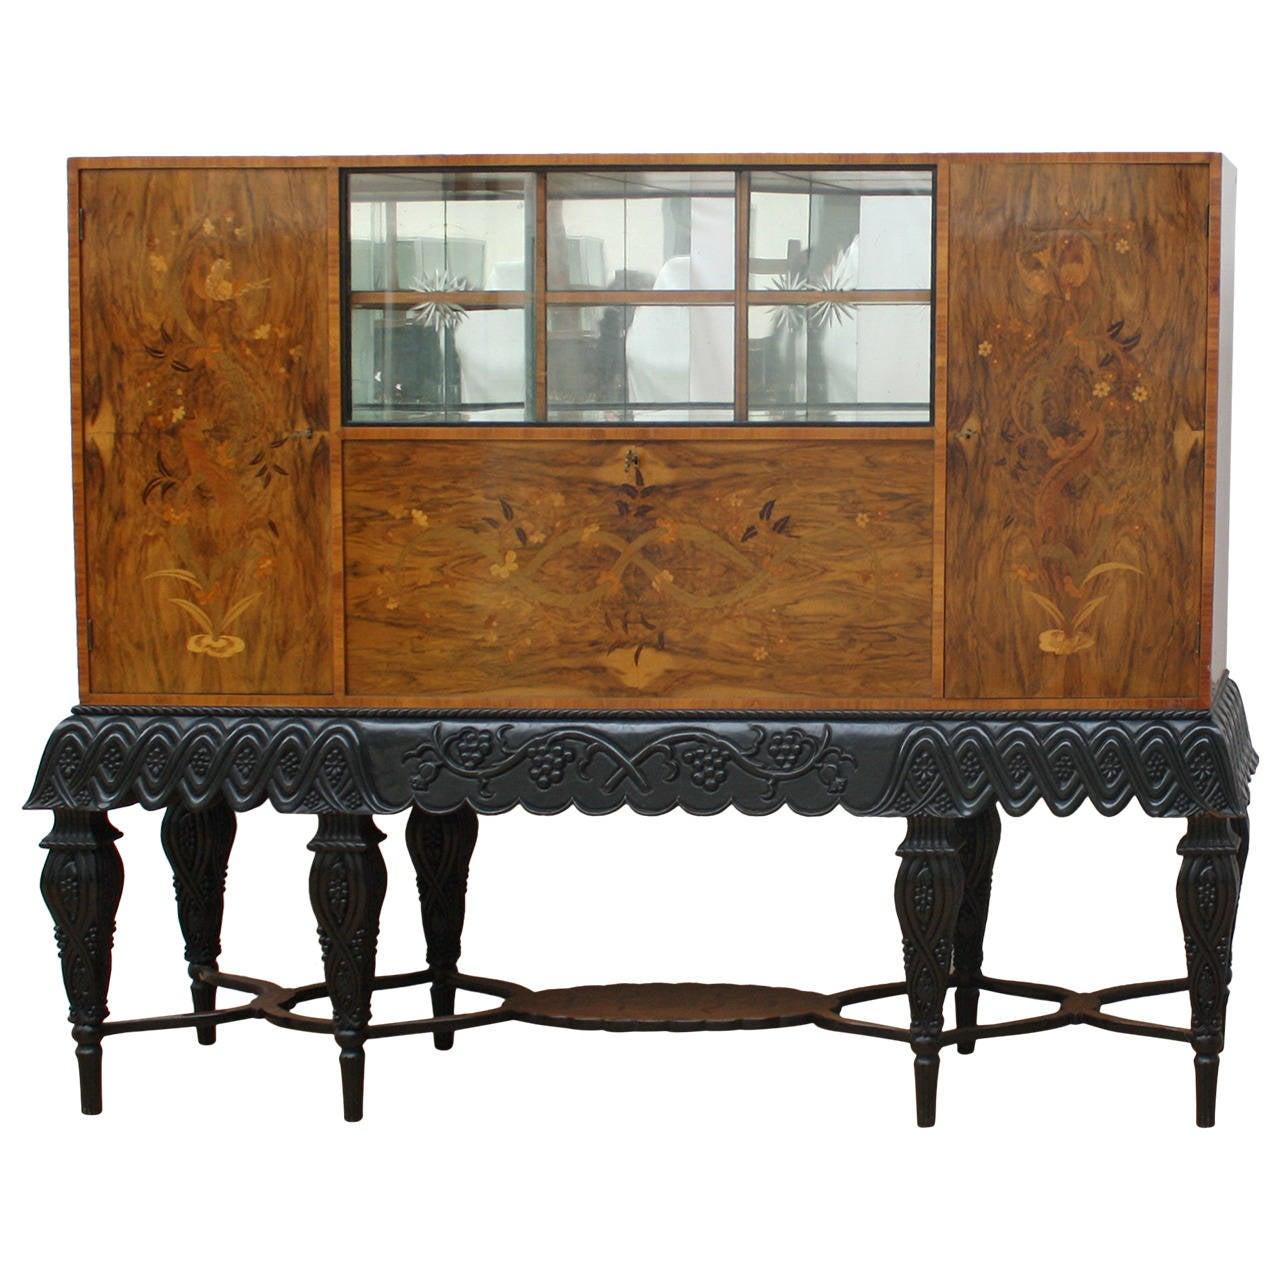 Austrian Art Deco Dry Bar Cabinet